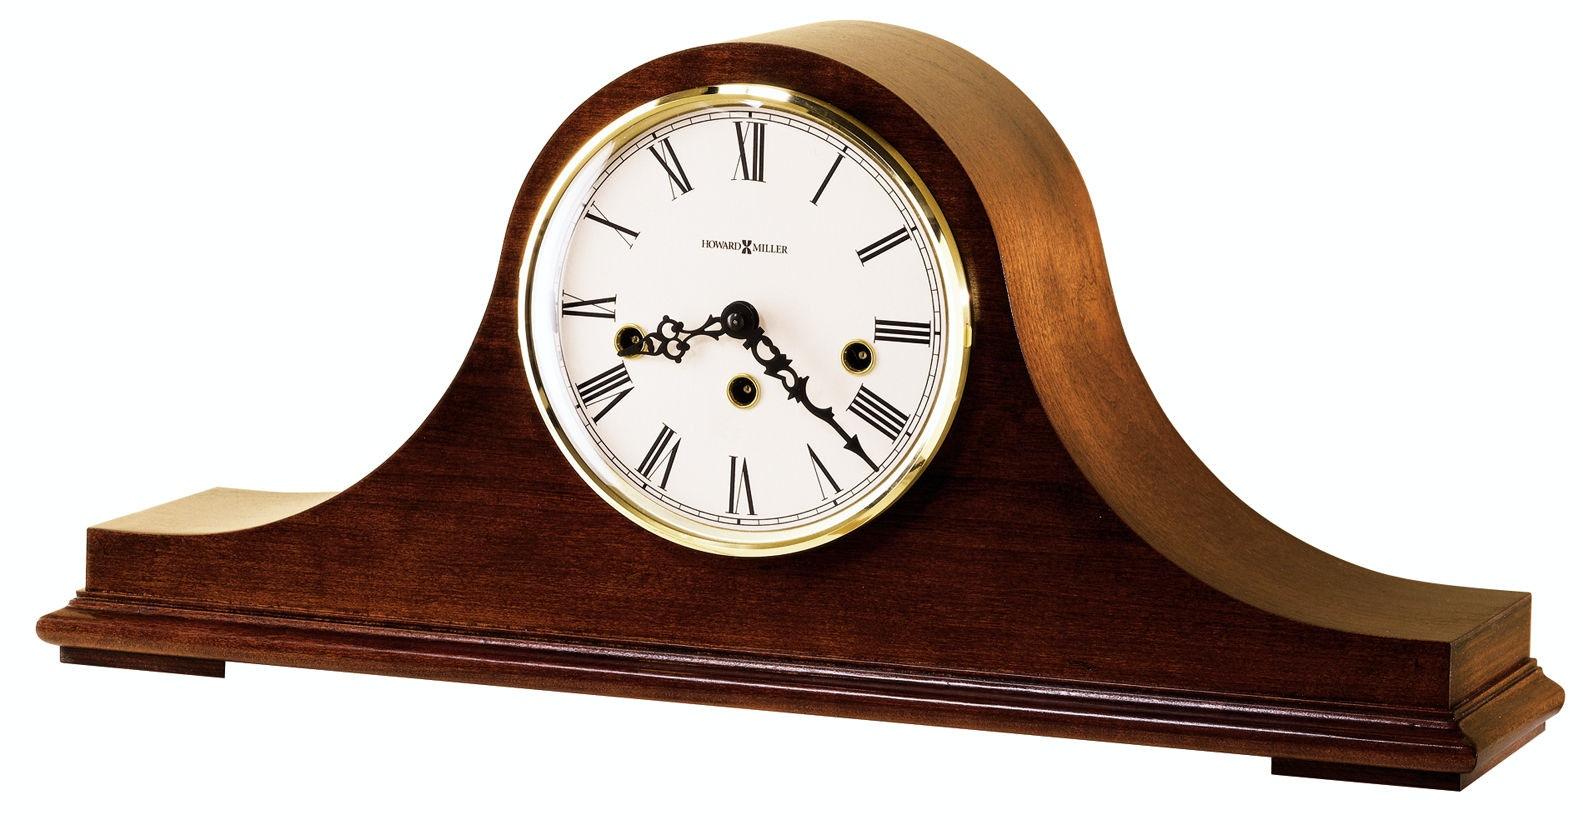 Howard miller mantel clock winding instructions